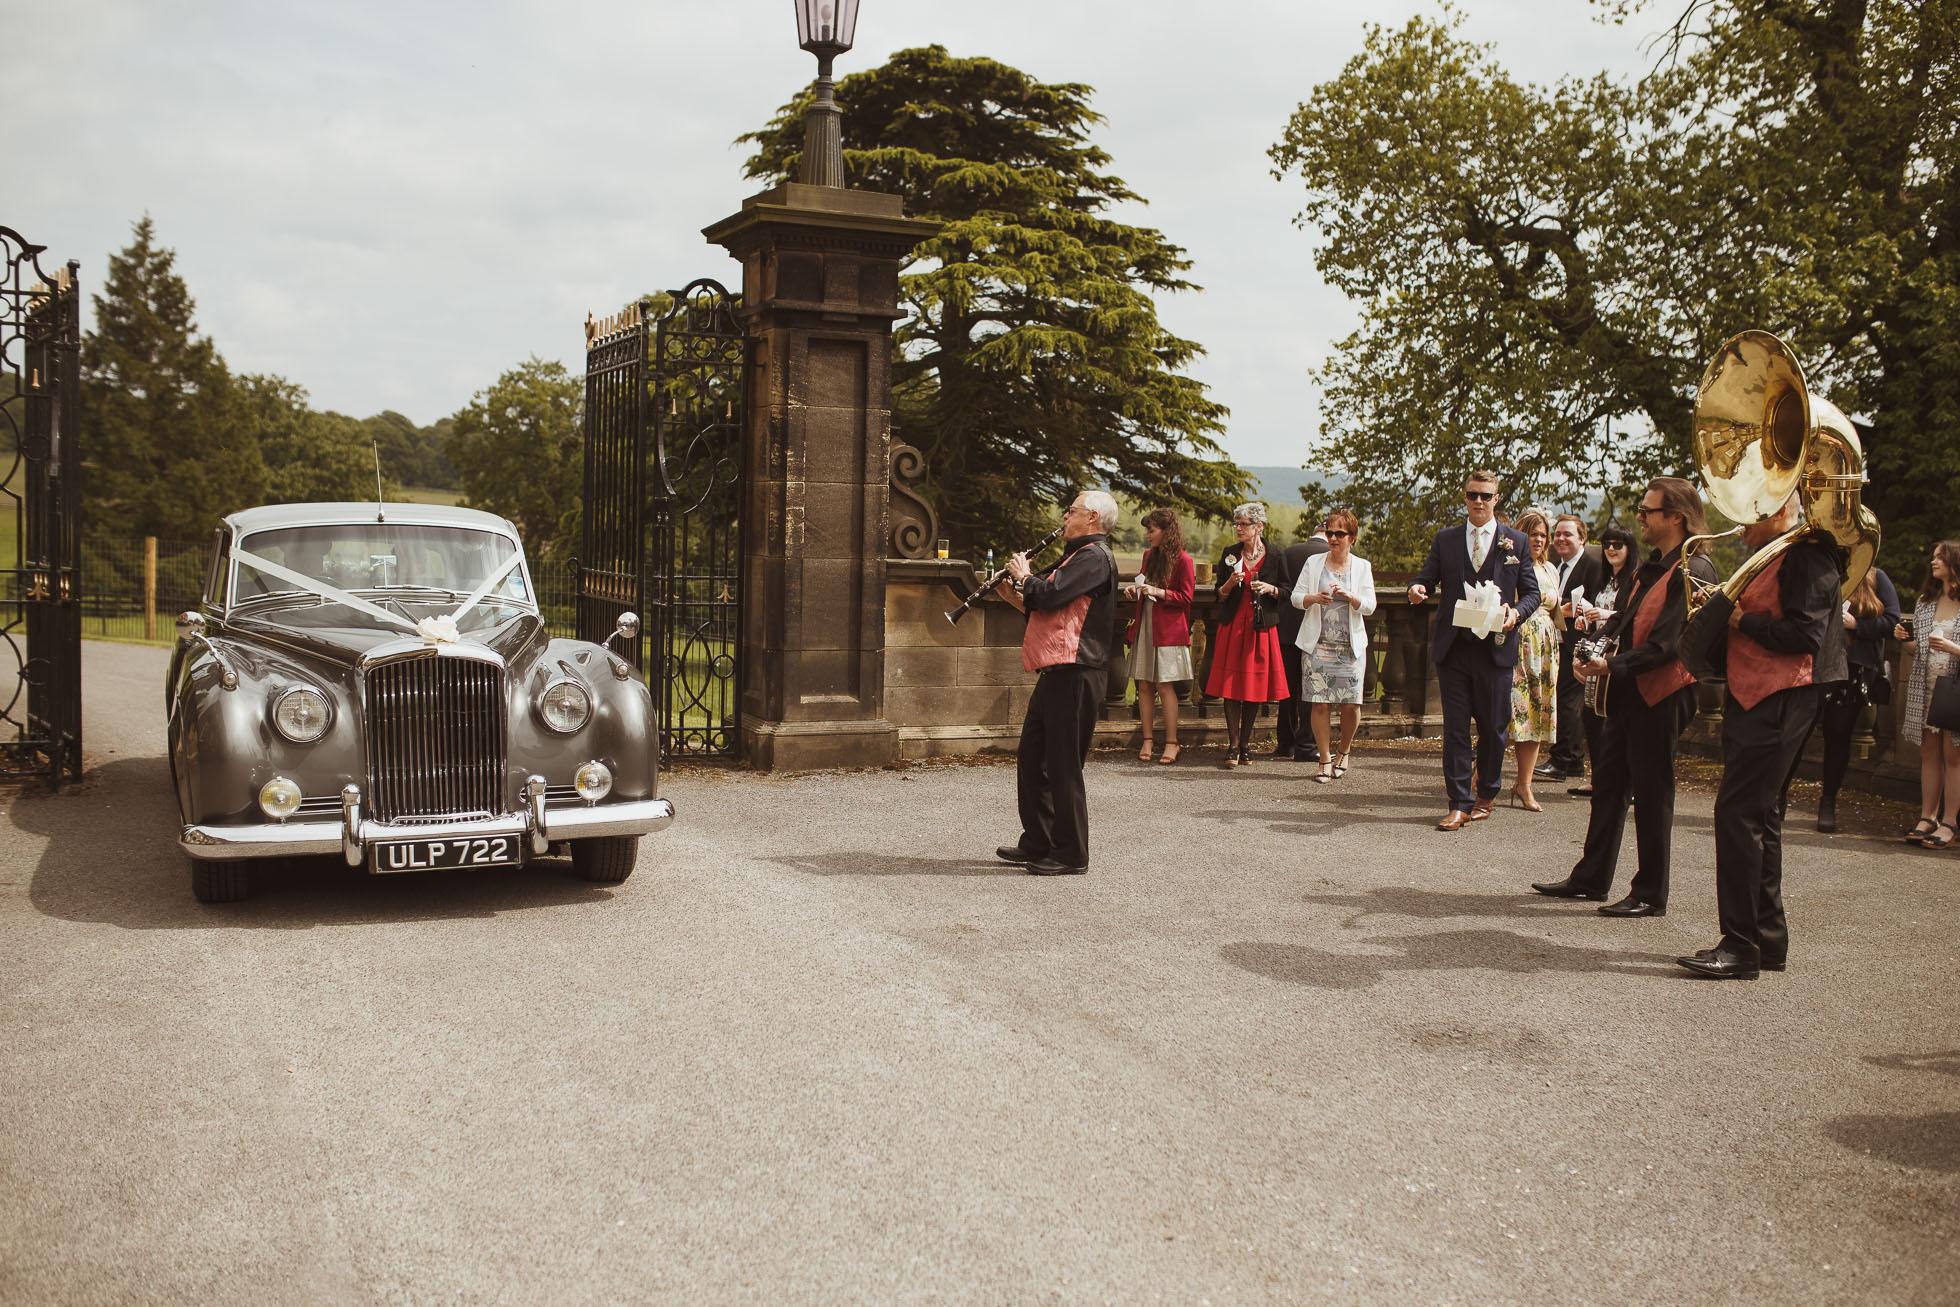 denton-hall-wedding-photographer-39.jpg